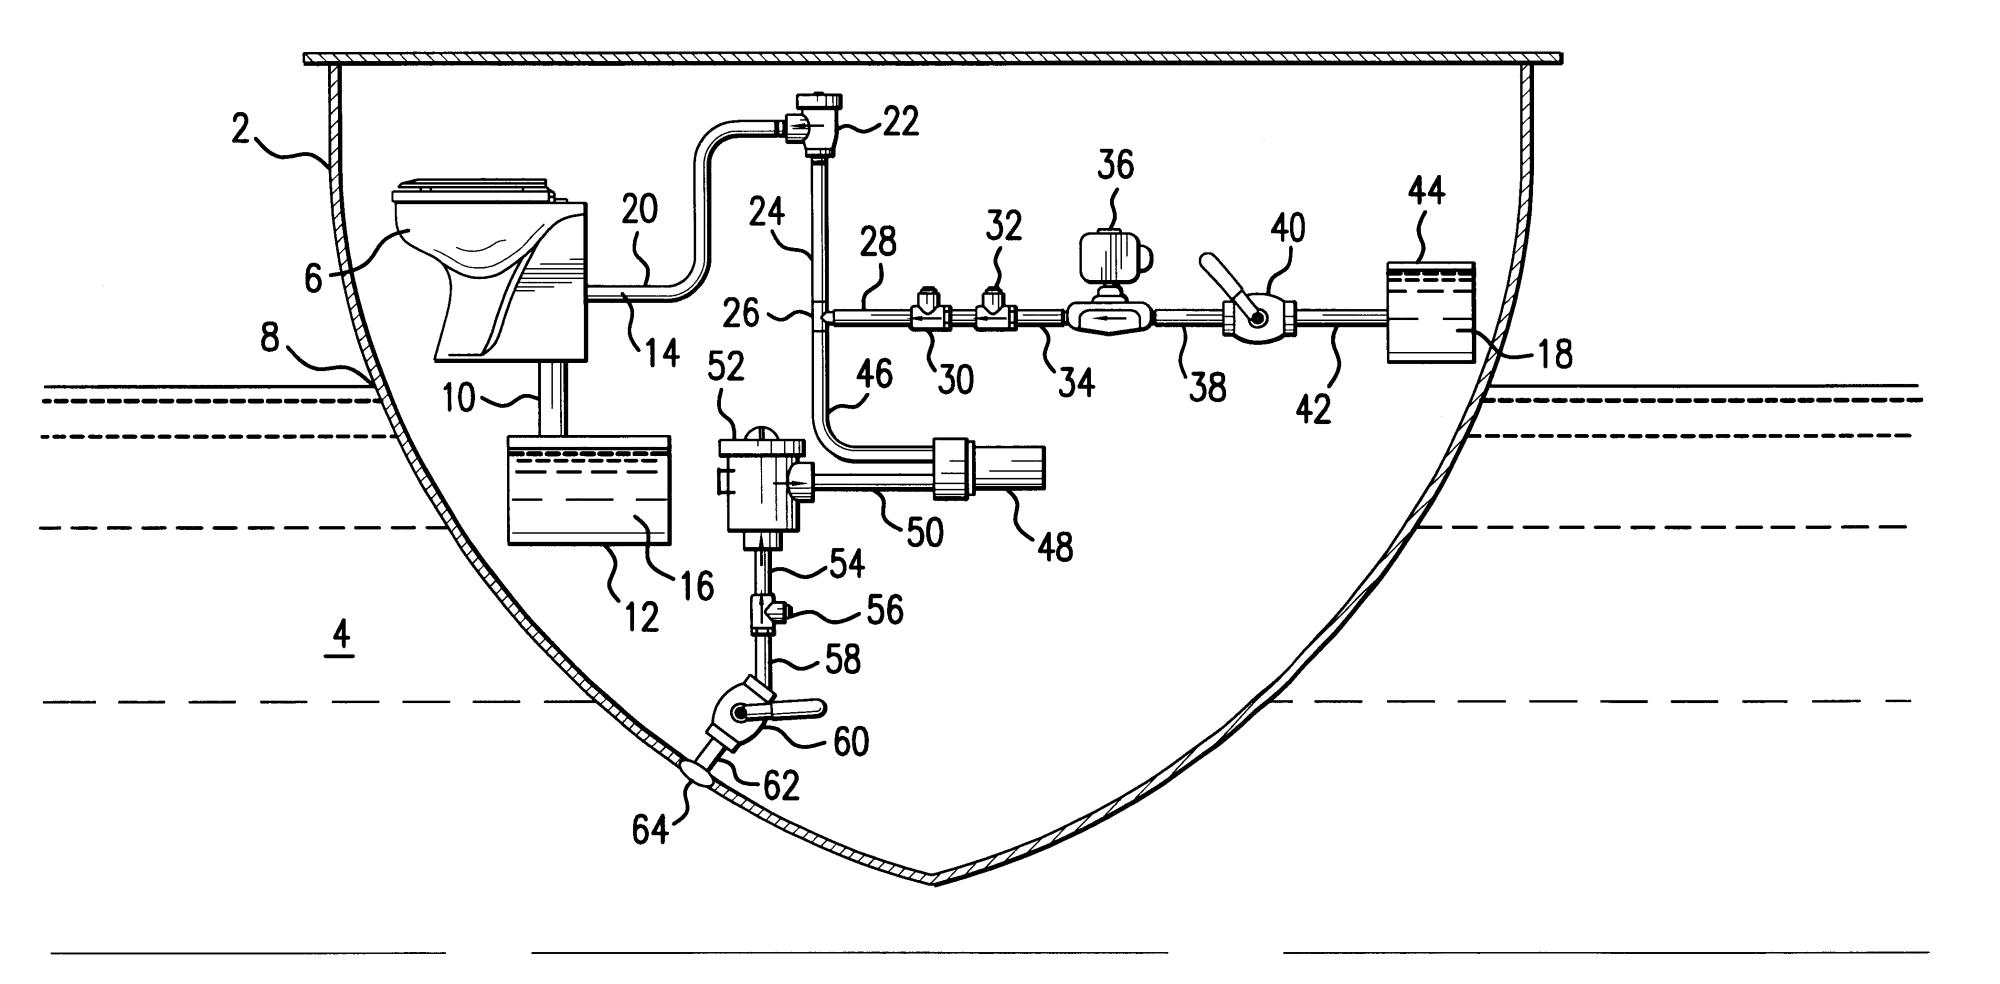 hight resolution of flojet pump wiring diagram wiring diagram repair guides